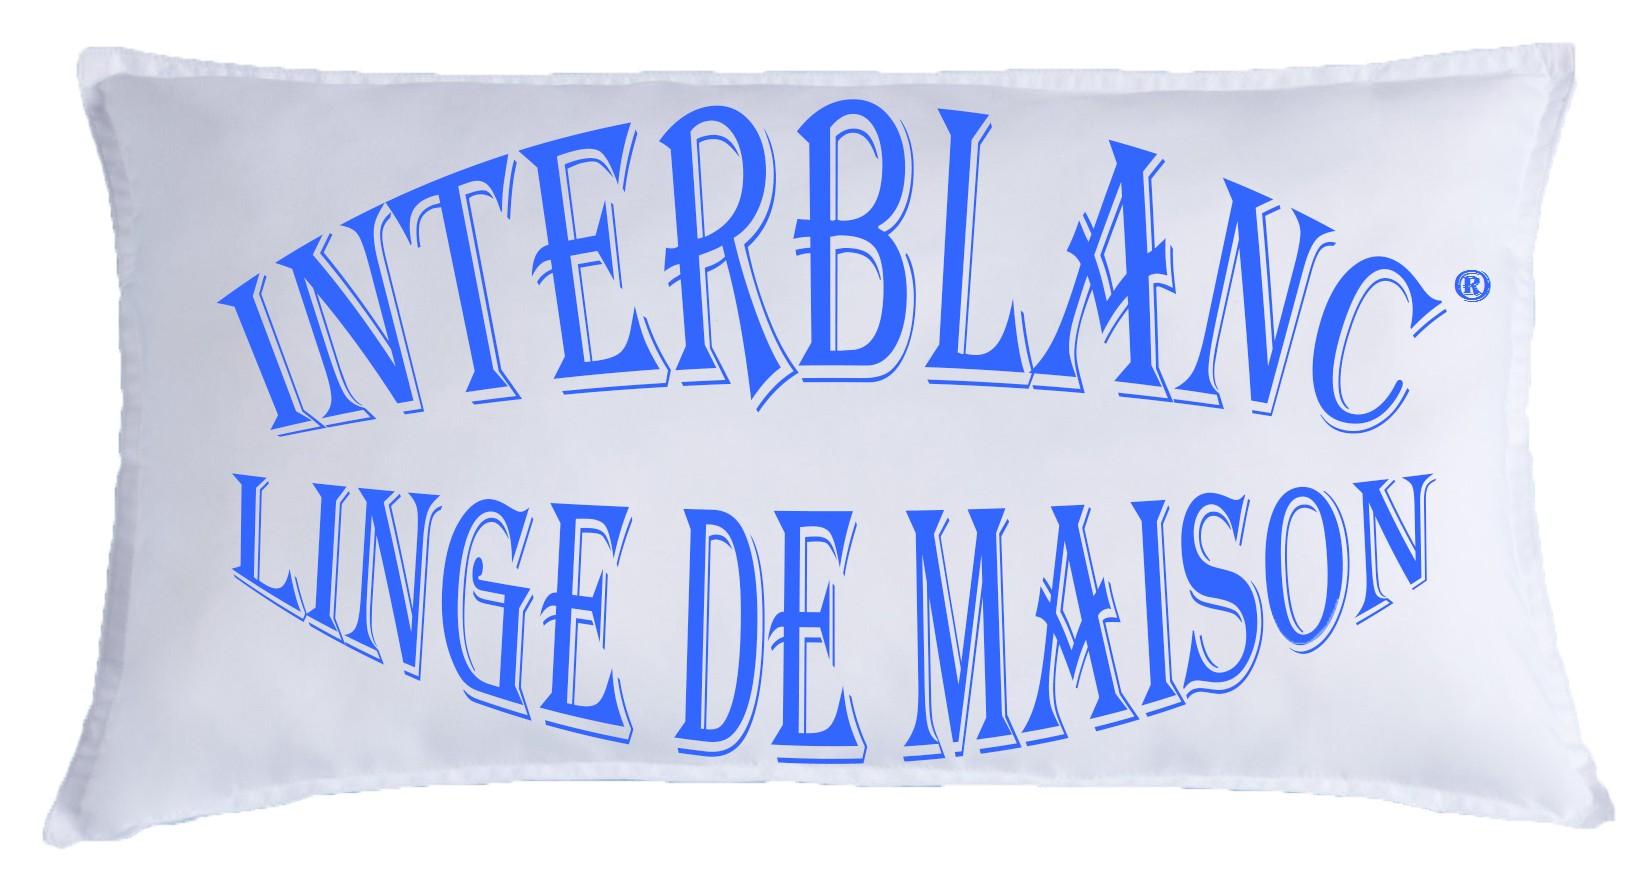 Interblanc.com